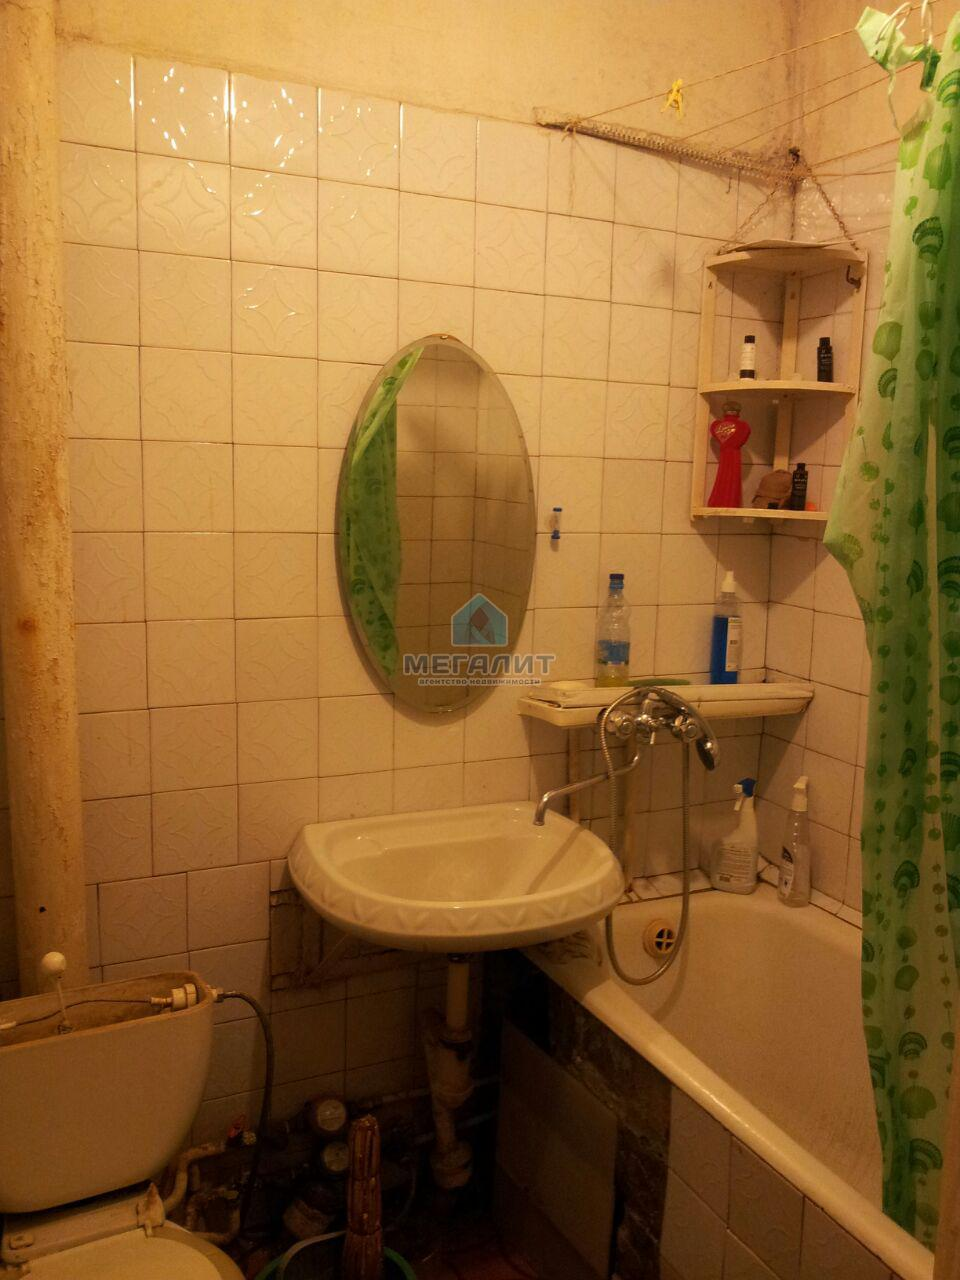 Аренда 1-к квартиры Карима Тинчурина 21, 32 м²  (миниатюра №7)